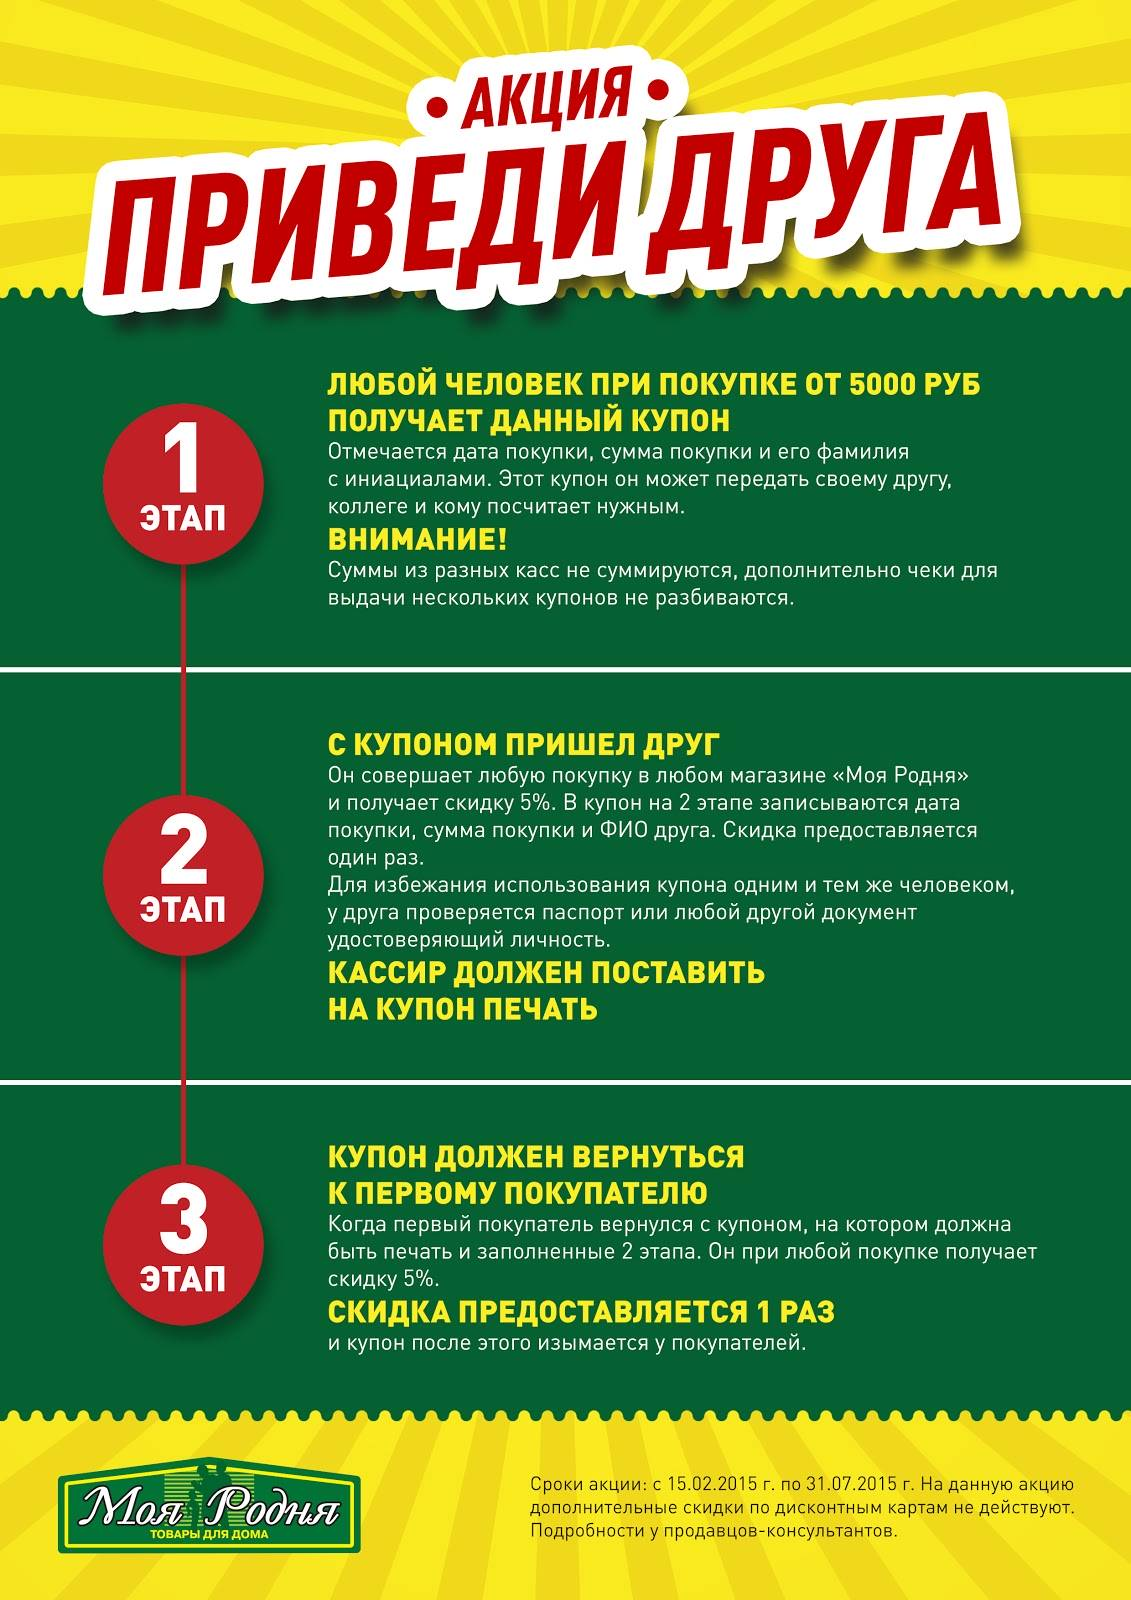 504e882ee700 Акции и распродажи  33 идеи, как привлечь покупателя   Retail.ru